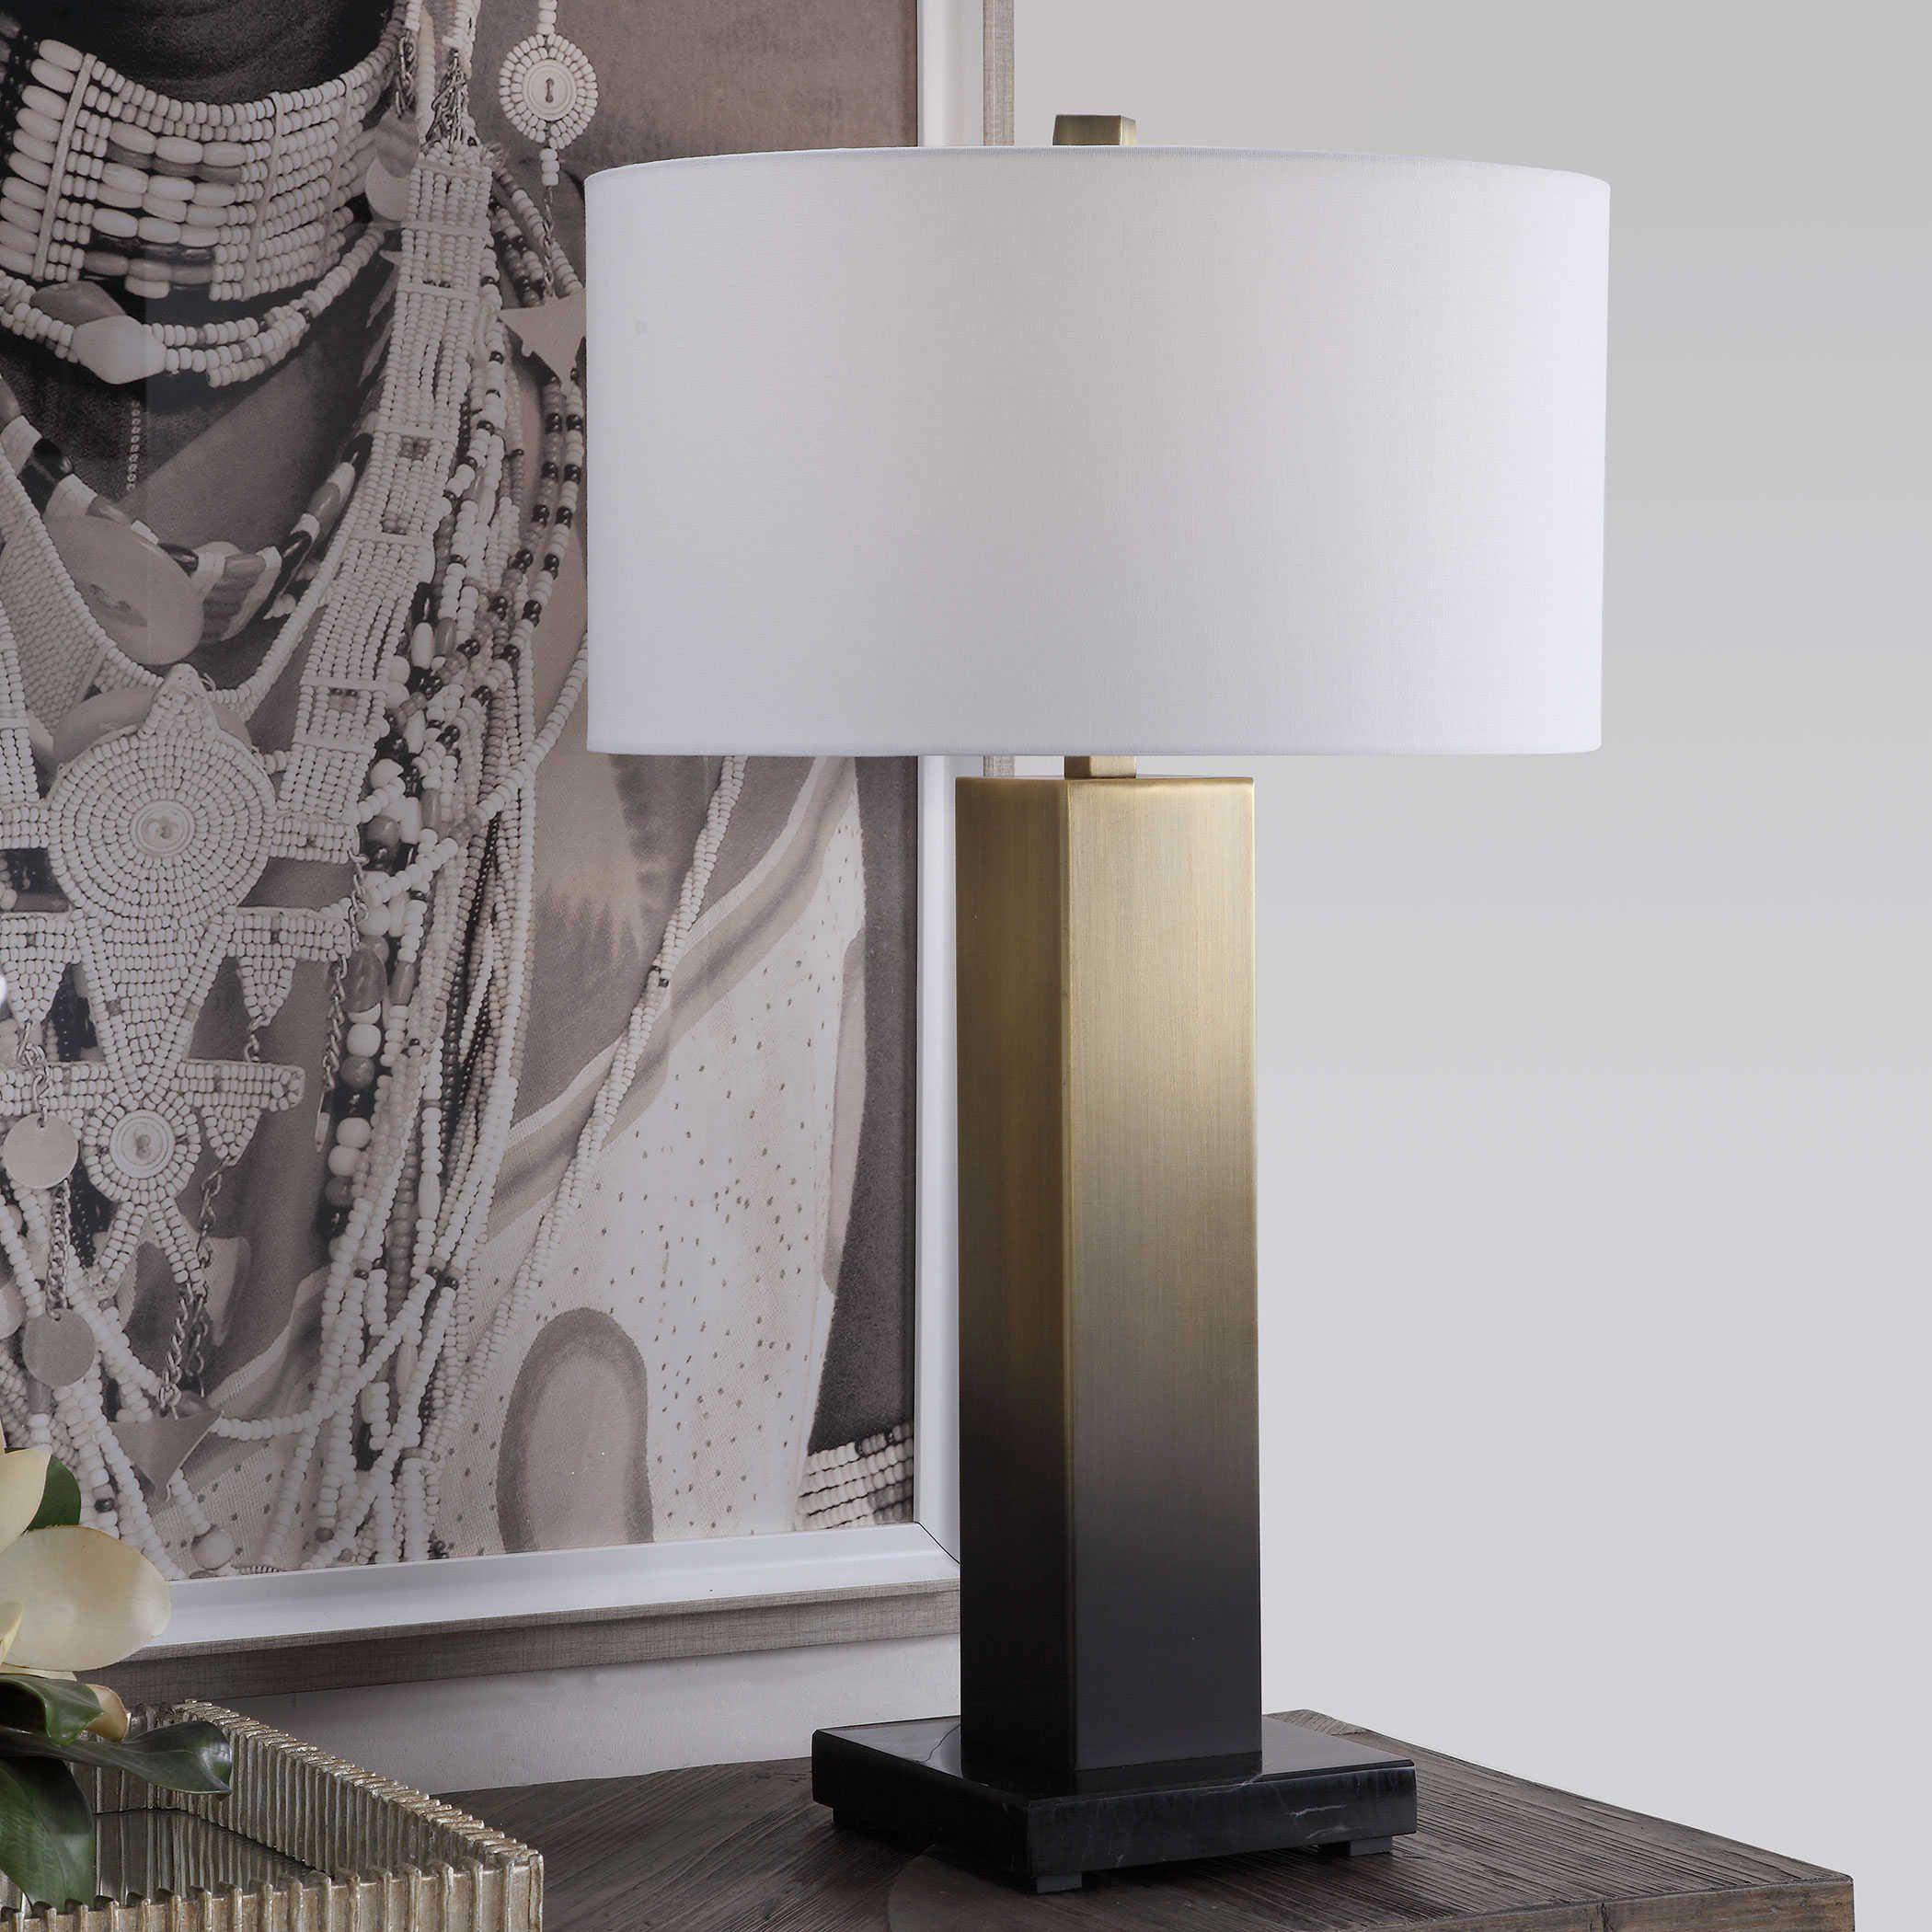 Ombre Table Lamps Combine Premium Quality Materials With Unique